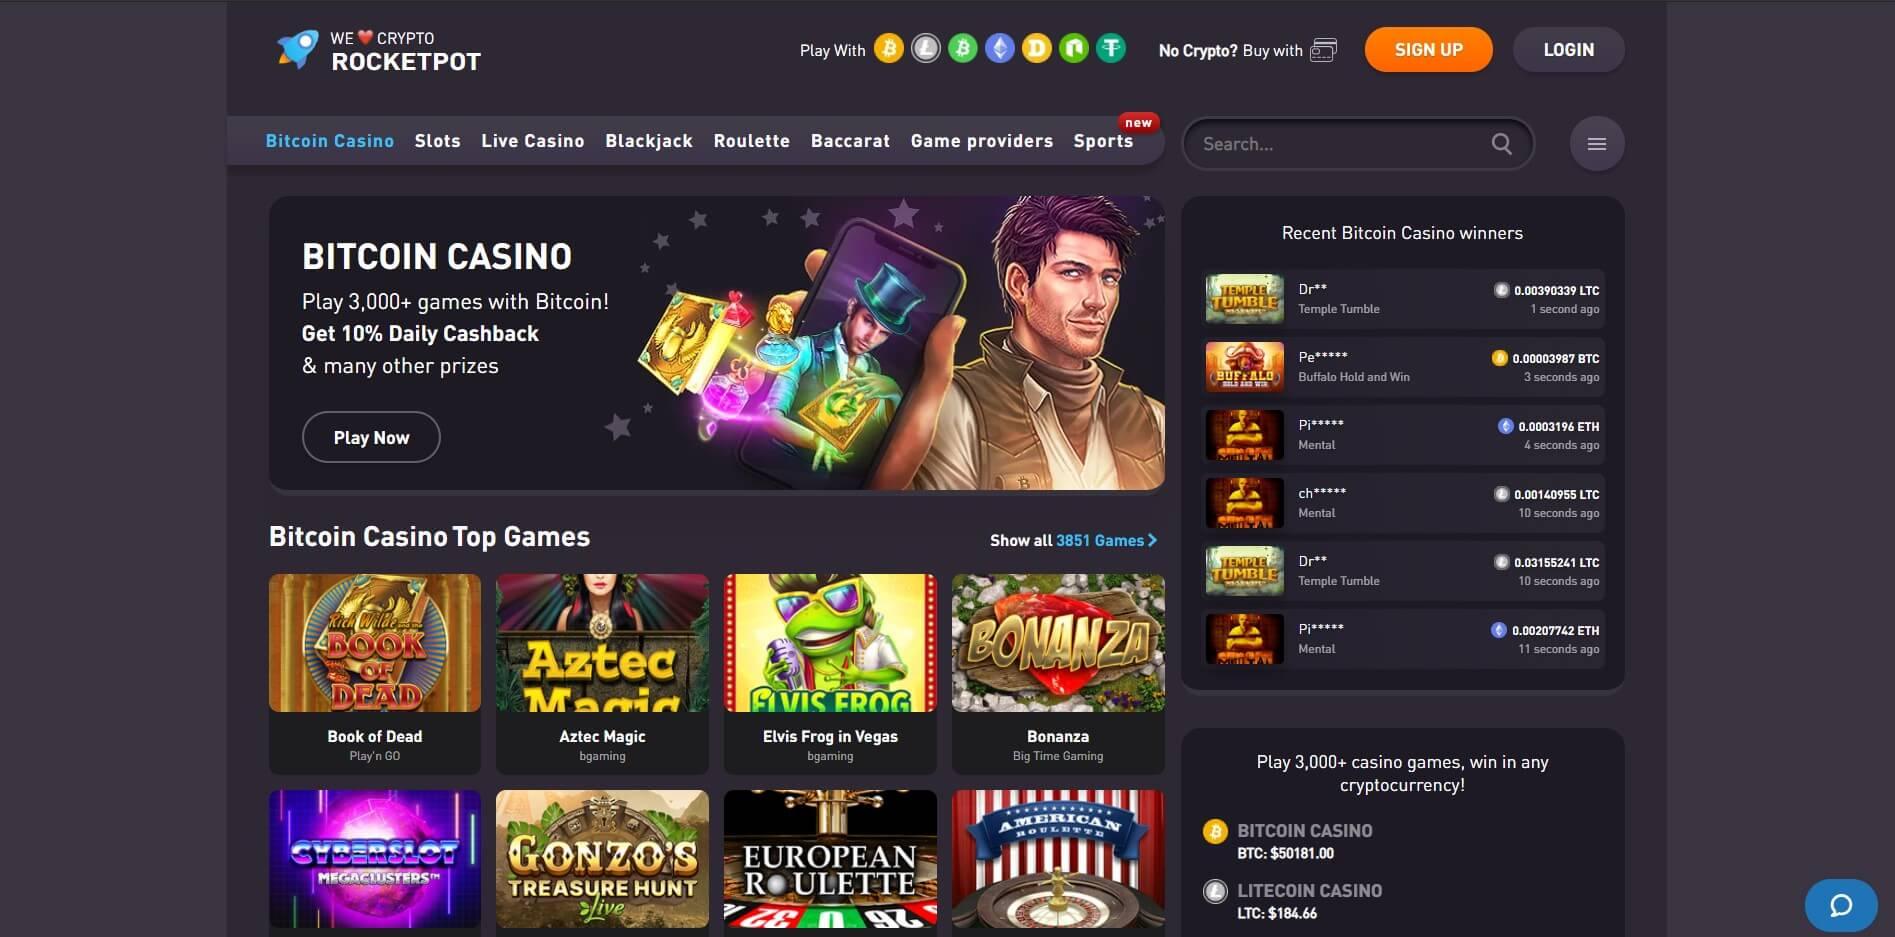 rocketpot.io - Website Review